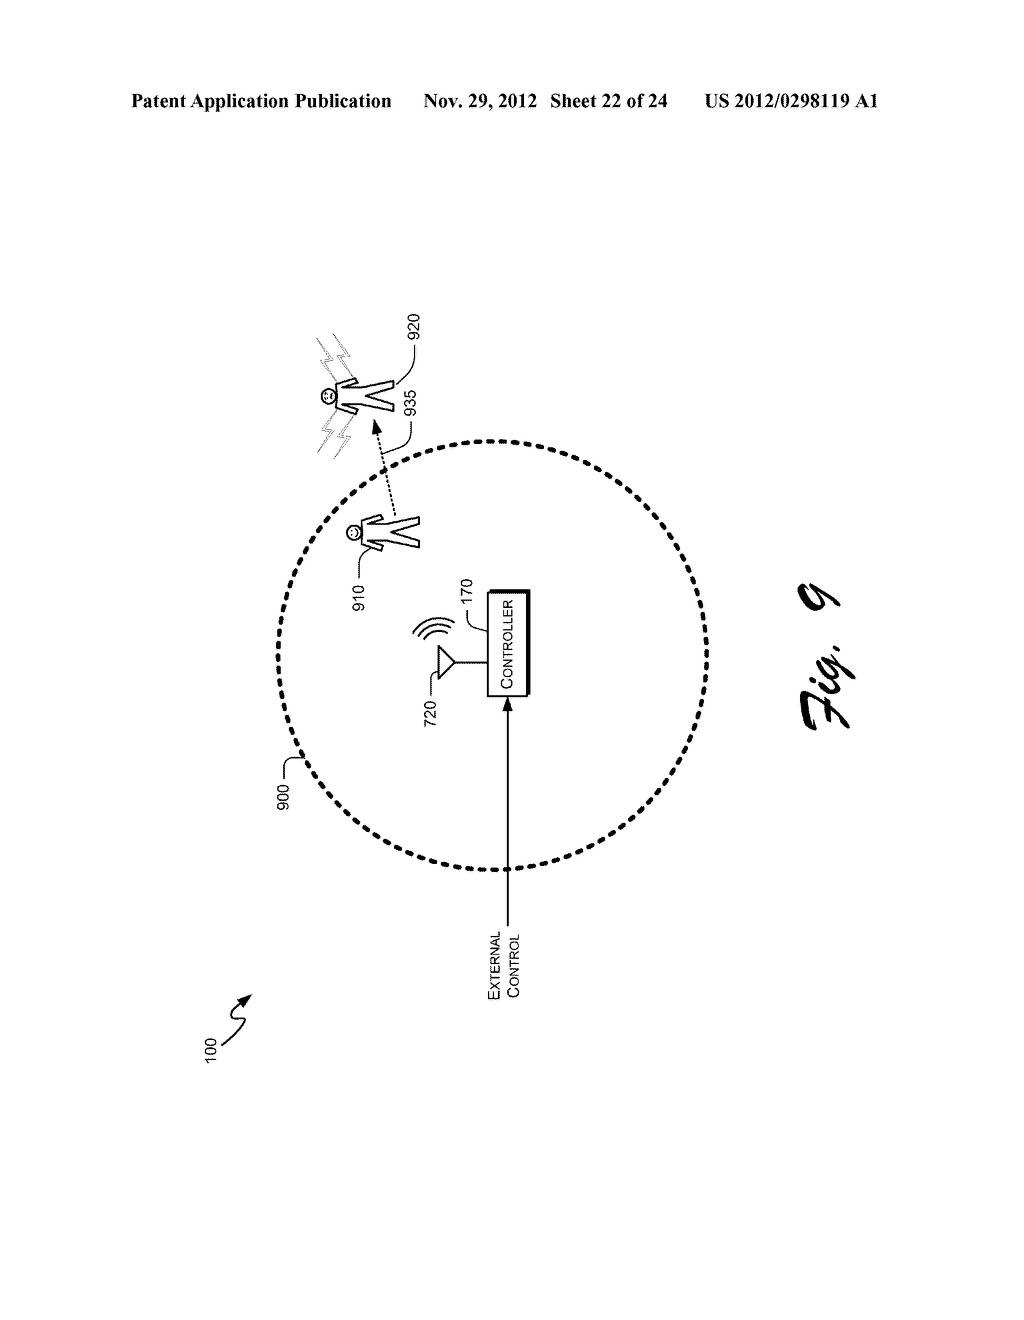 handcuffs-patent23